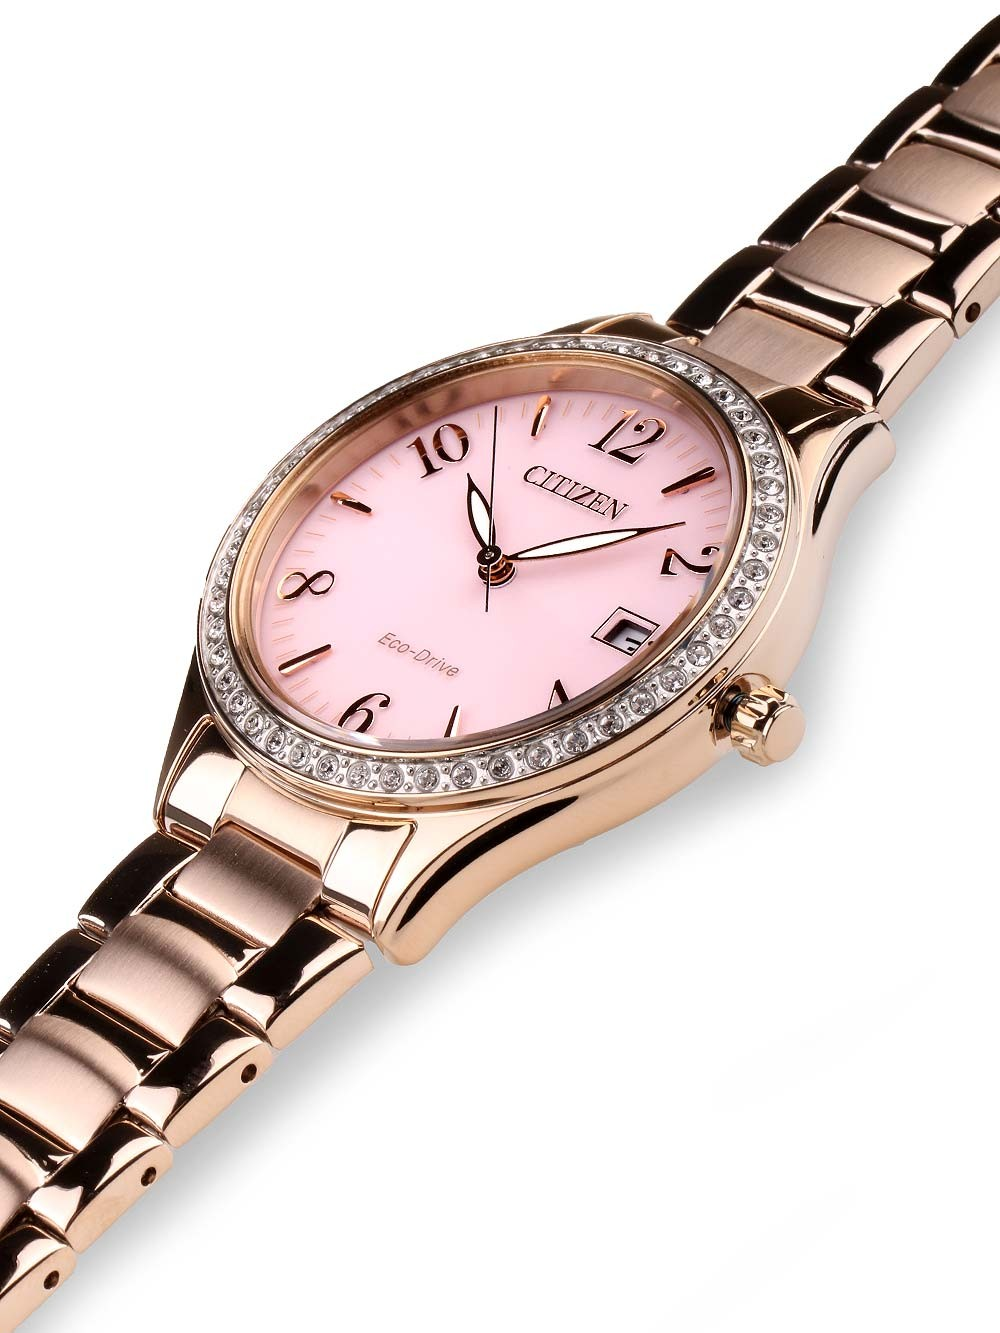 watches chrono12 citizen eo1183 84x eco drive elegant damen 34mm 5atm. Black Bedroom Furniture Sets. Home Design Ideas